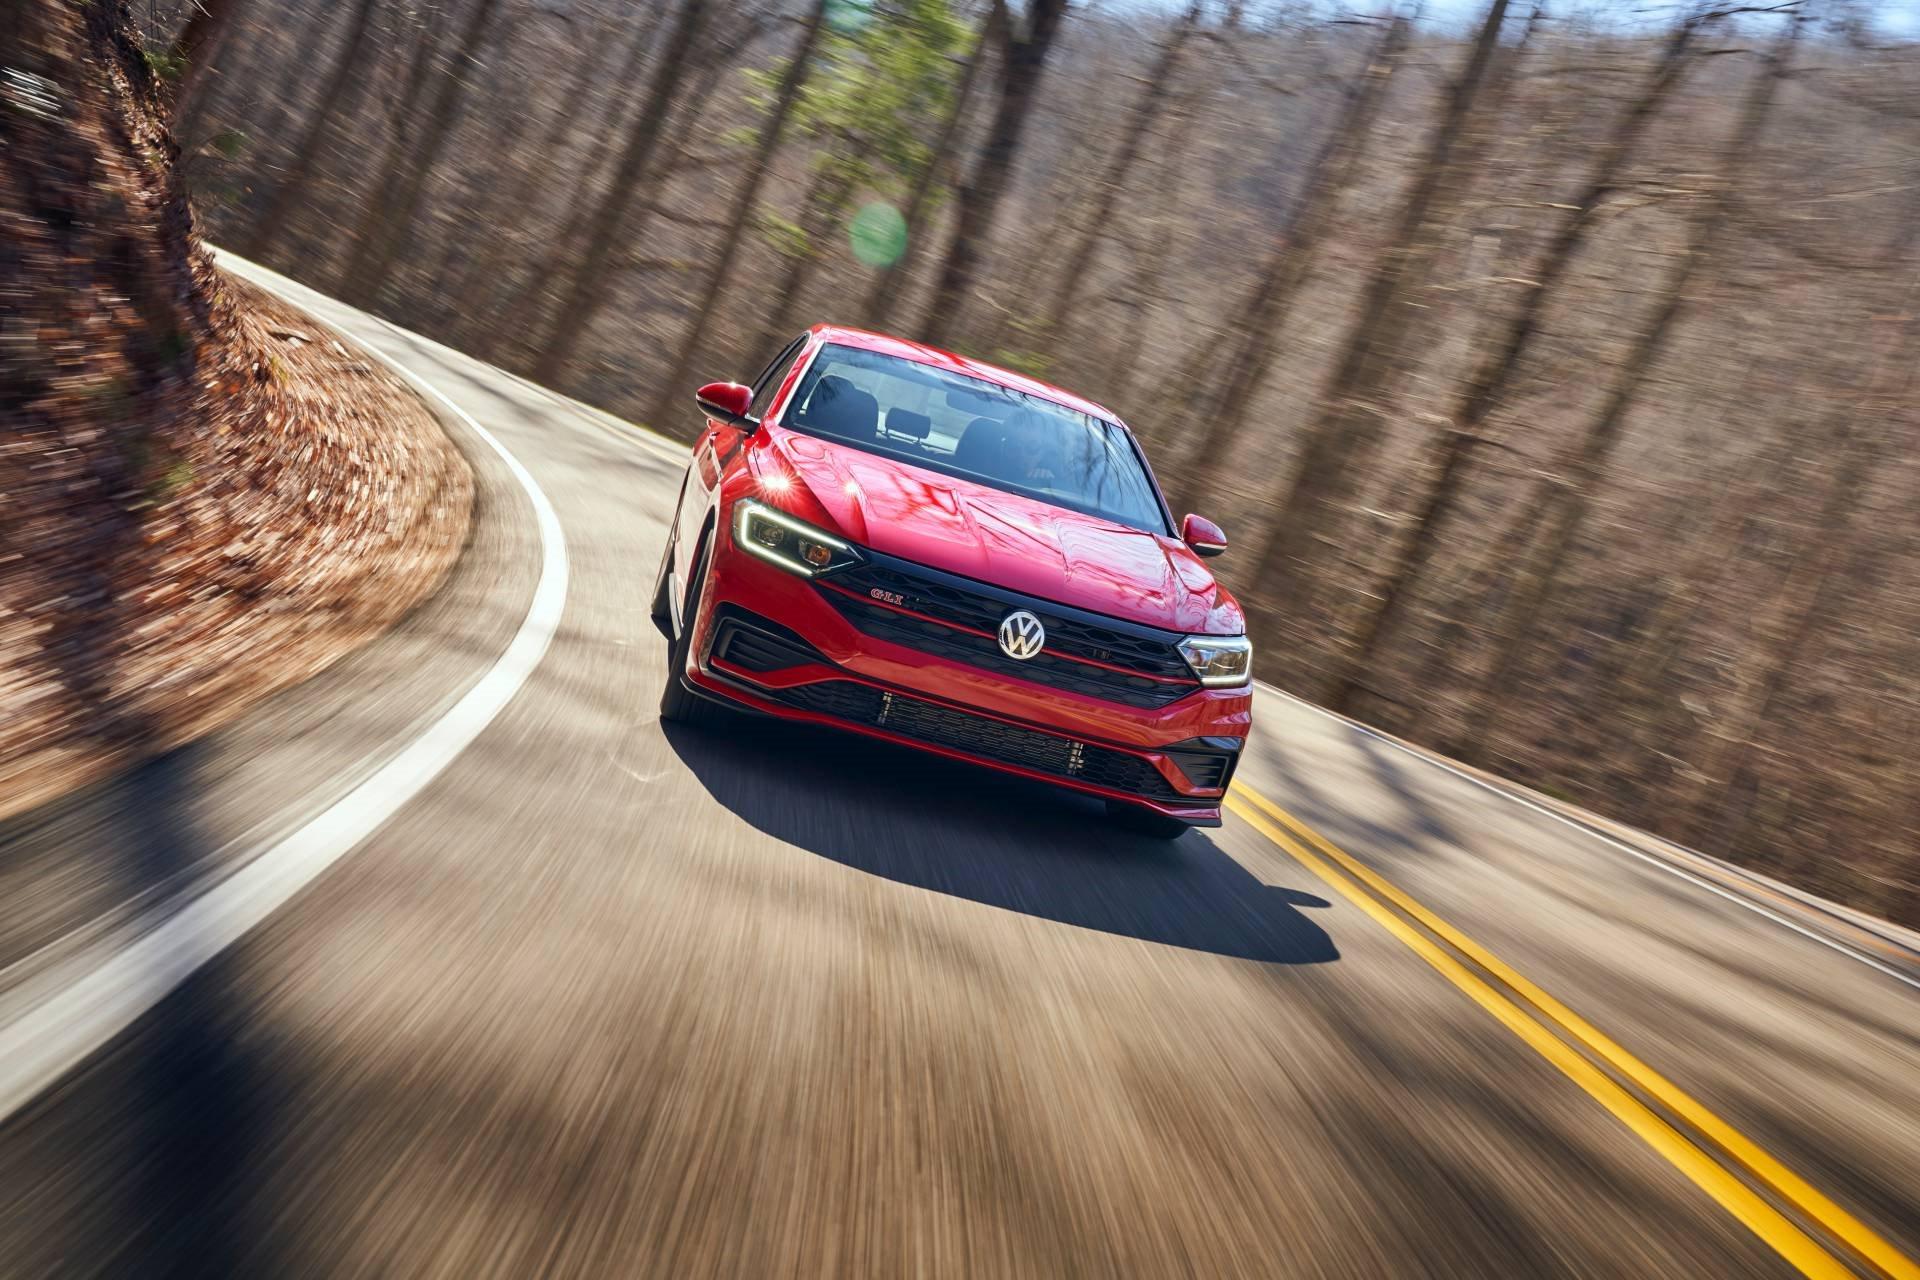 New 2019 Volkswagen-Jetta GLI 35th Anniversary Edition Jetta GLI 35th Anniversary Edition for sale $26,995 at M and V Leasing in Brooklyn NY 11223 1